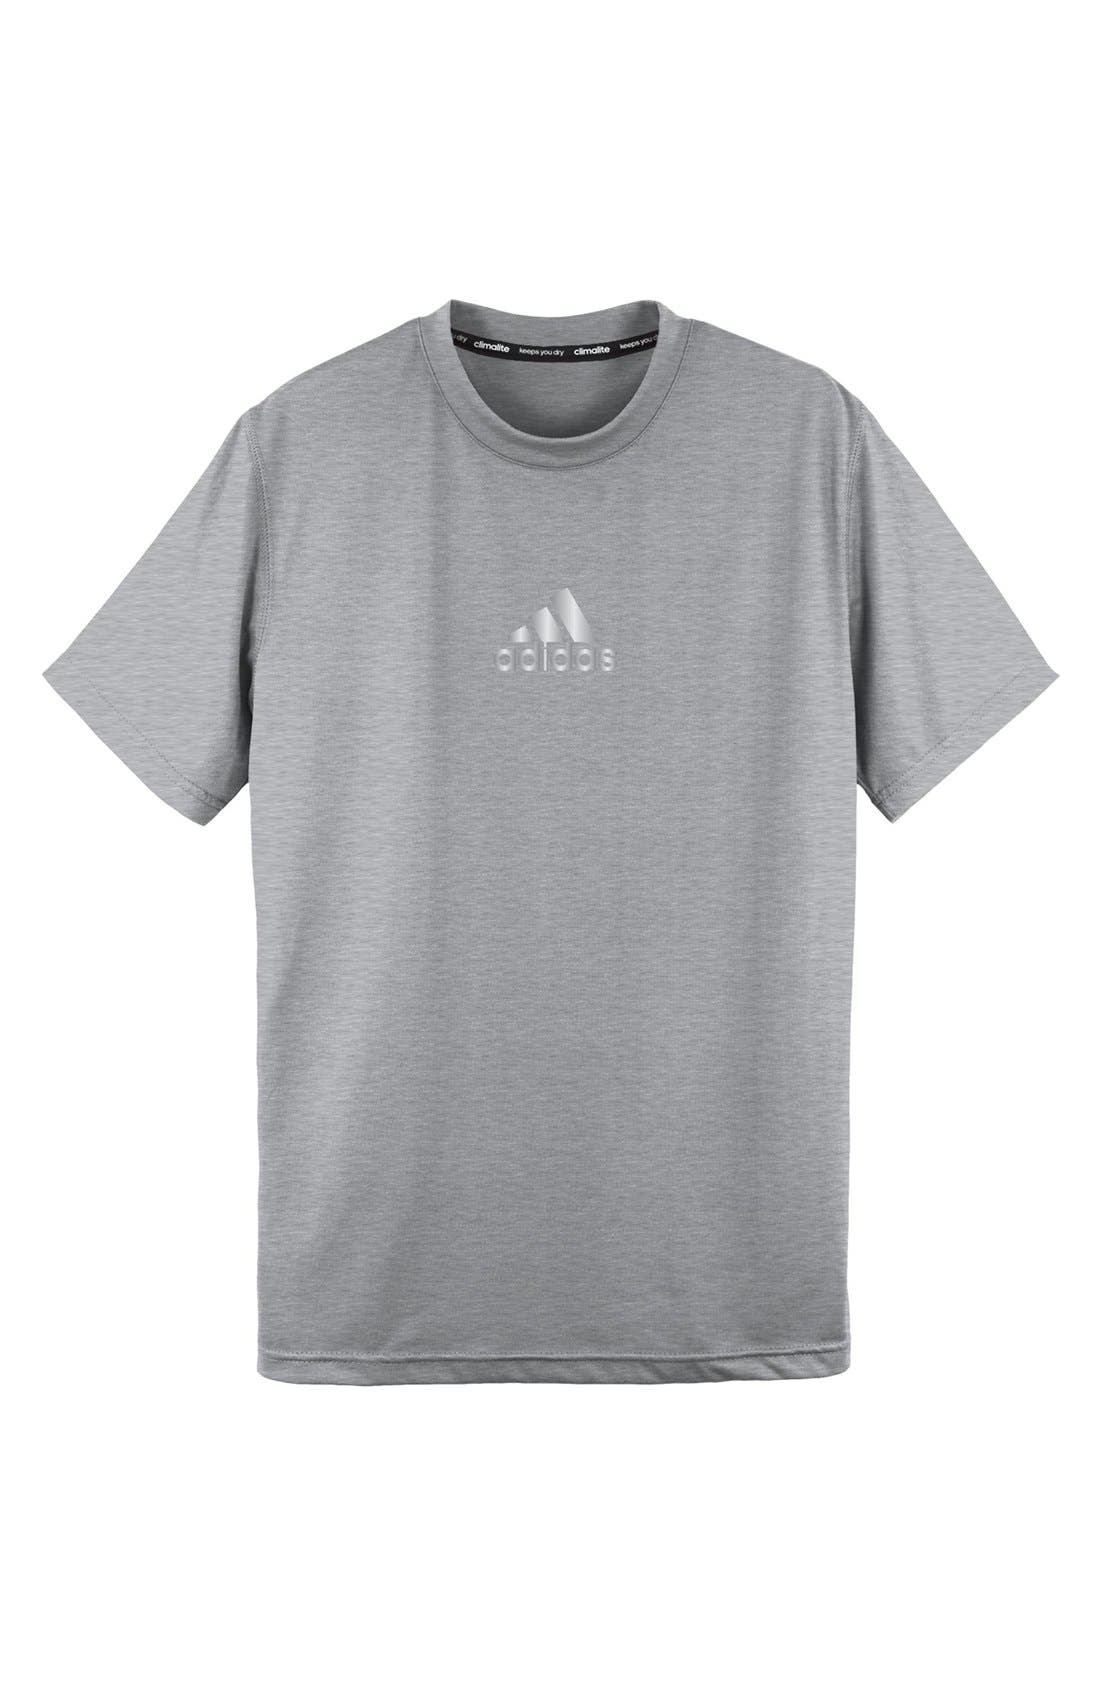 Alternate Image 1 Selected - adidas 'Ultimate' T-Shirt (Big Boys)